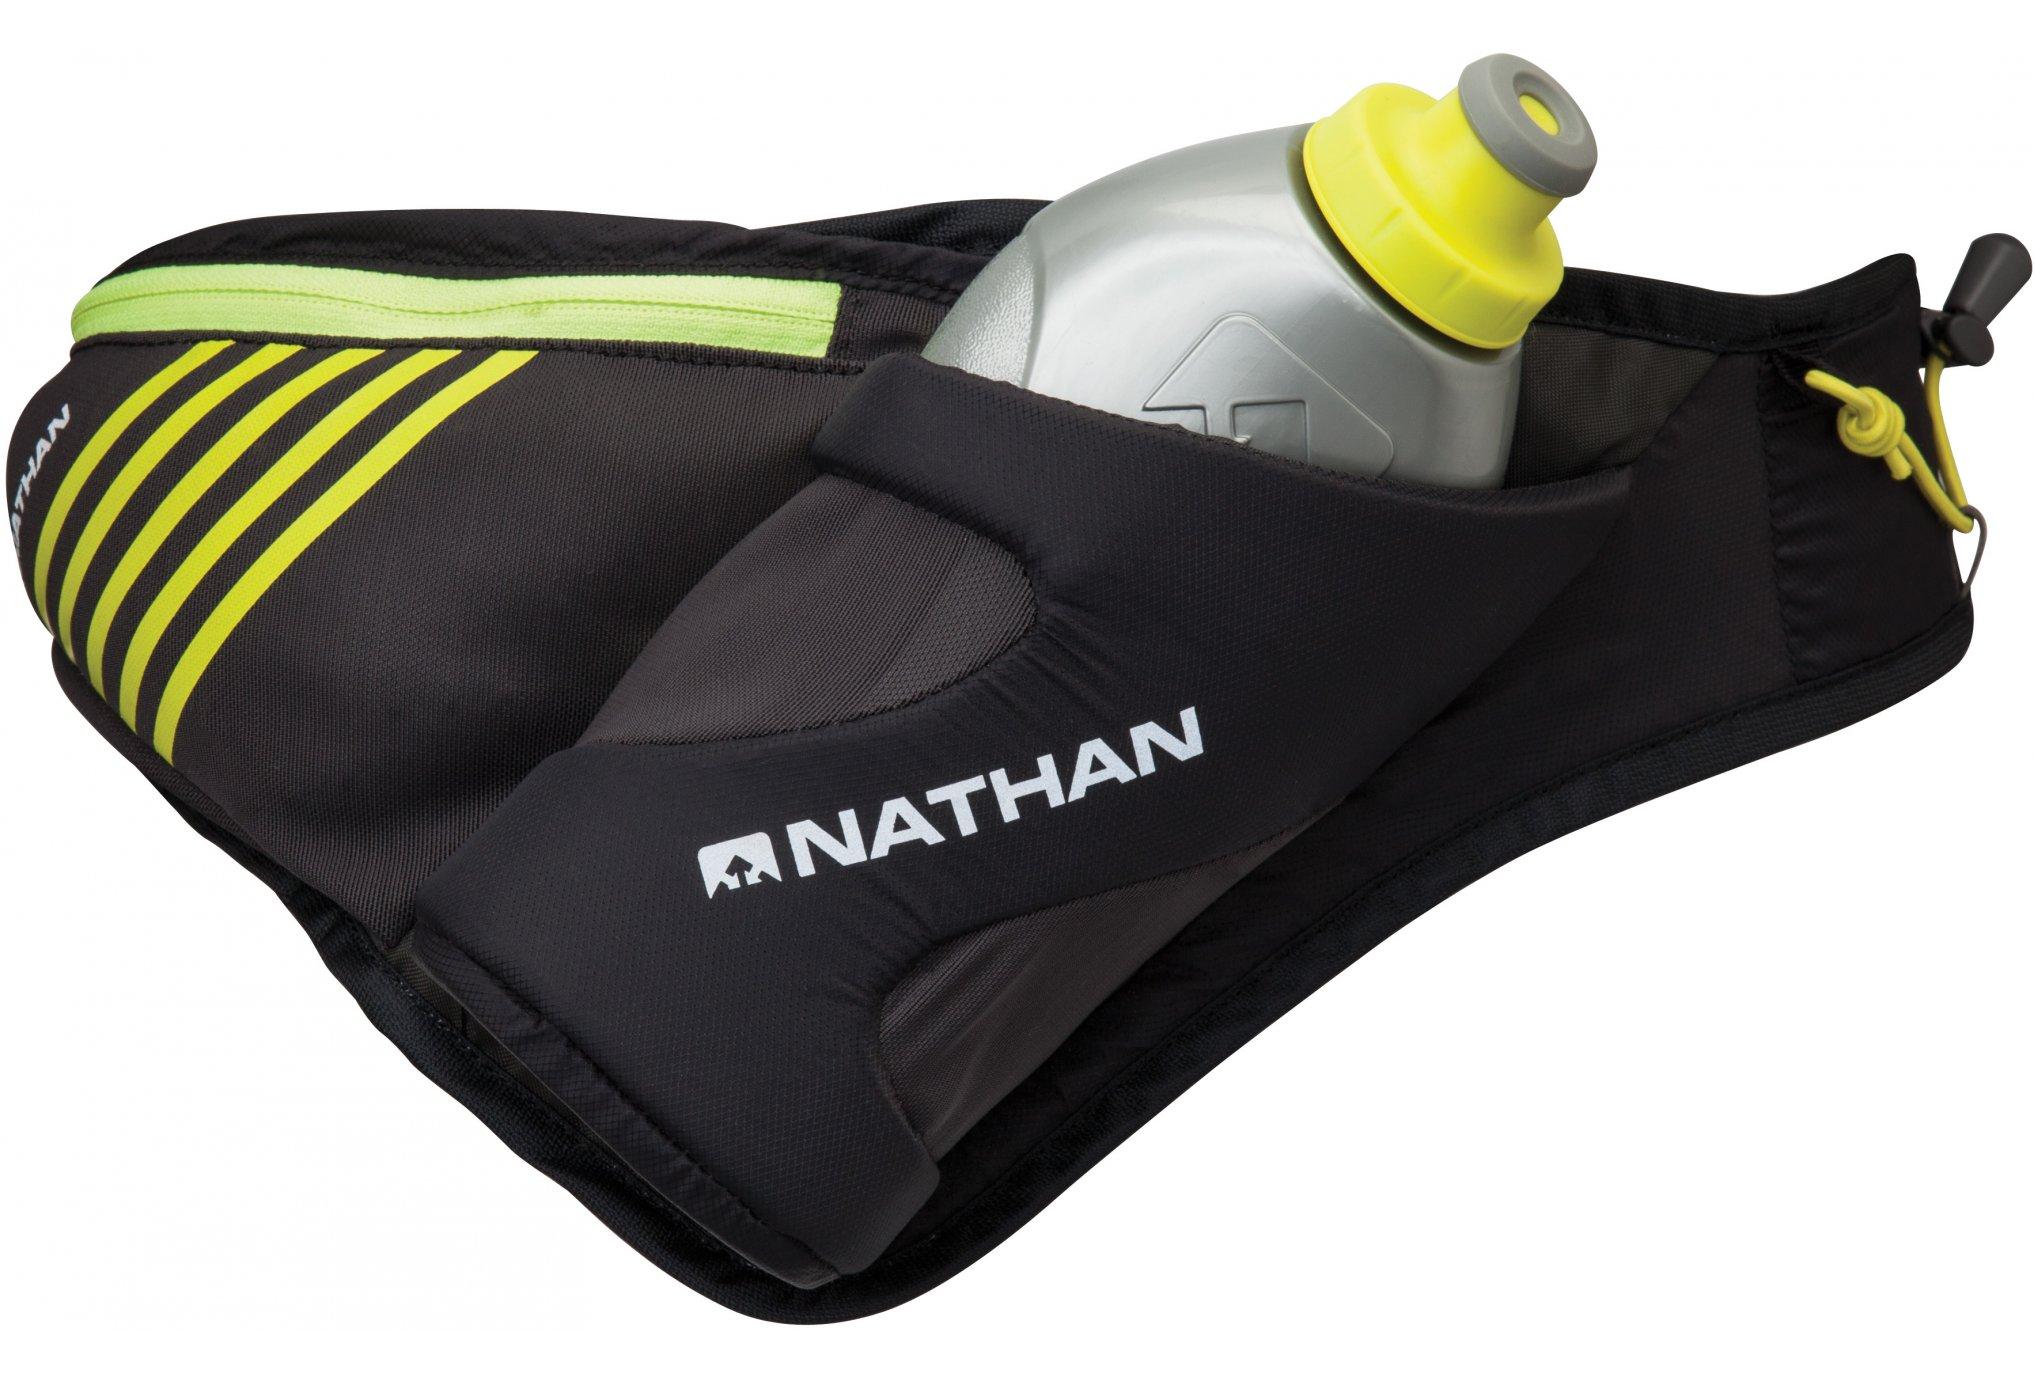 Nathan Ceinture Porte Bidon Peak Sac hydratation / Gourde